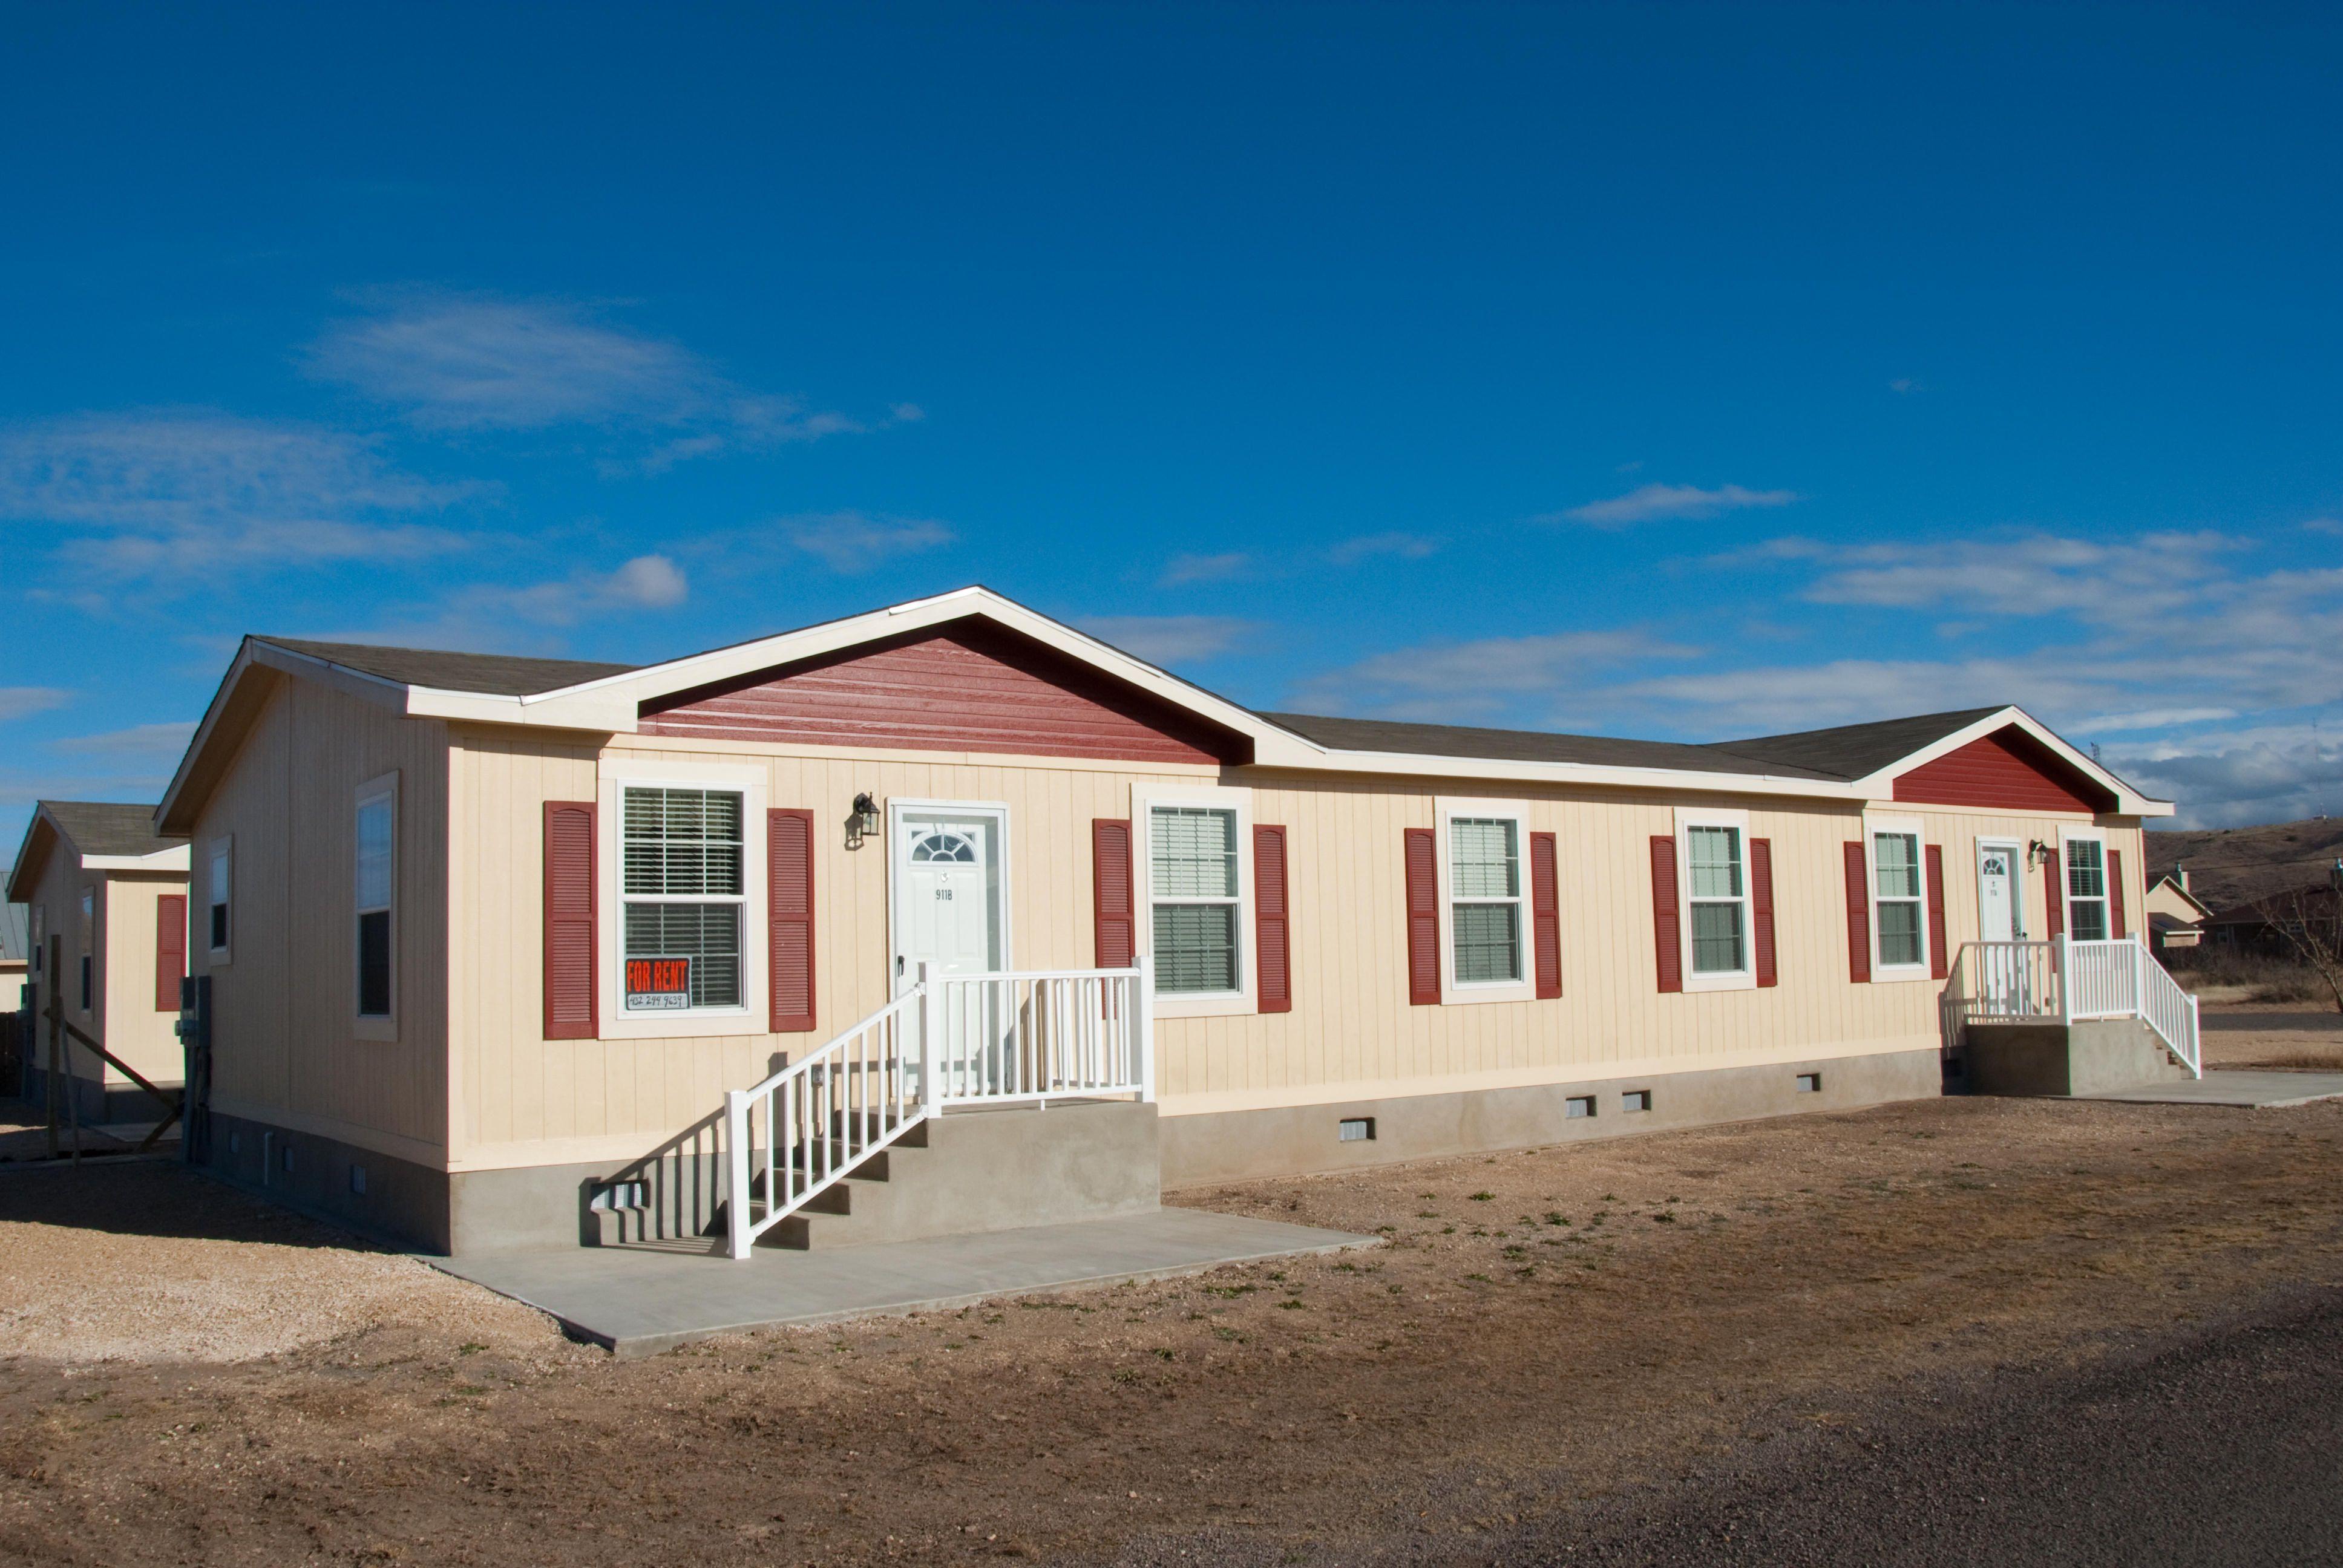 Duplex Real estate houses